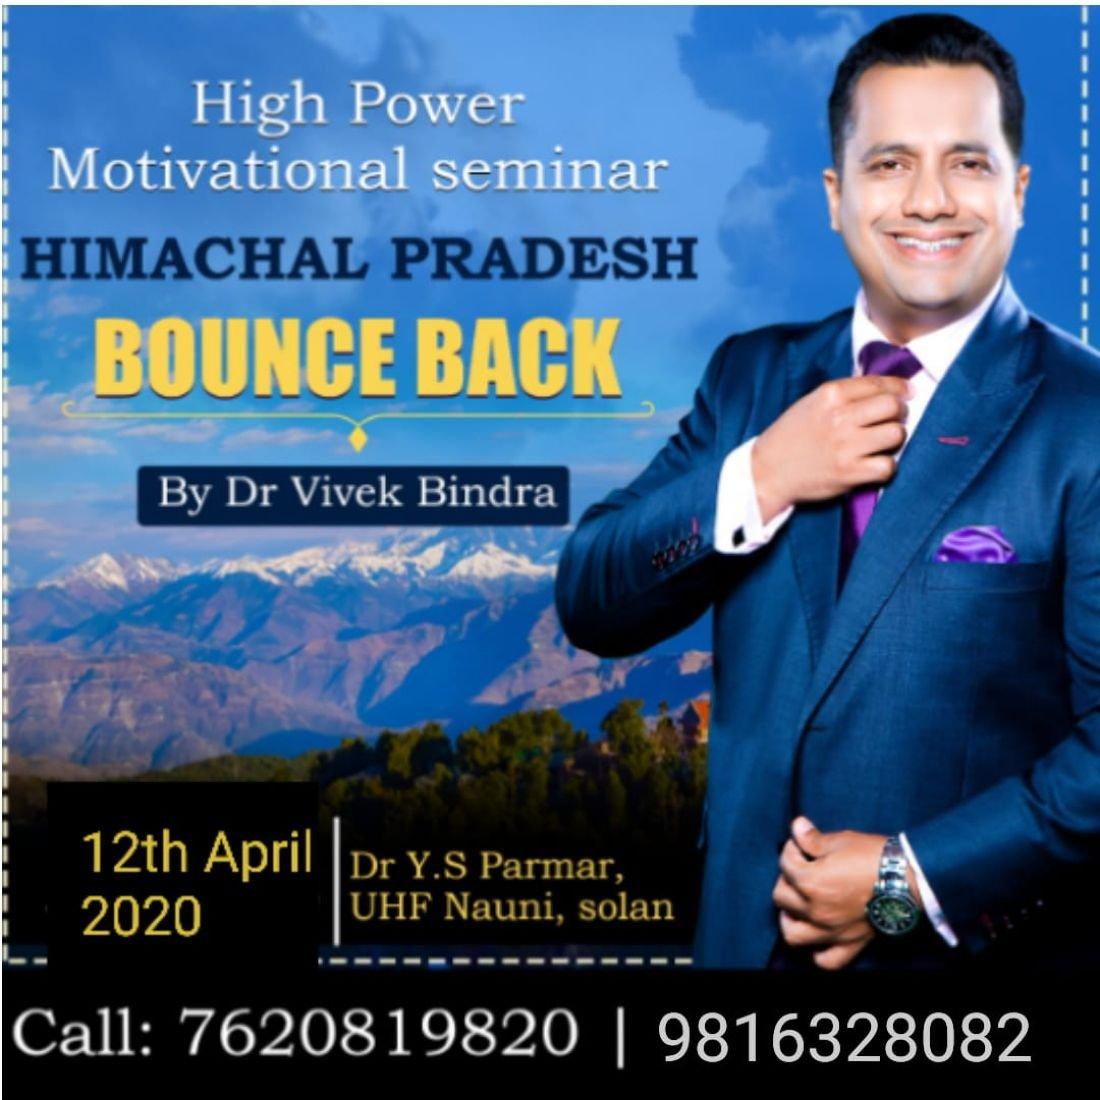 Bounce Back Himachal Pradesh by Dr. Vivek Bindra